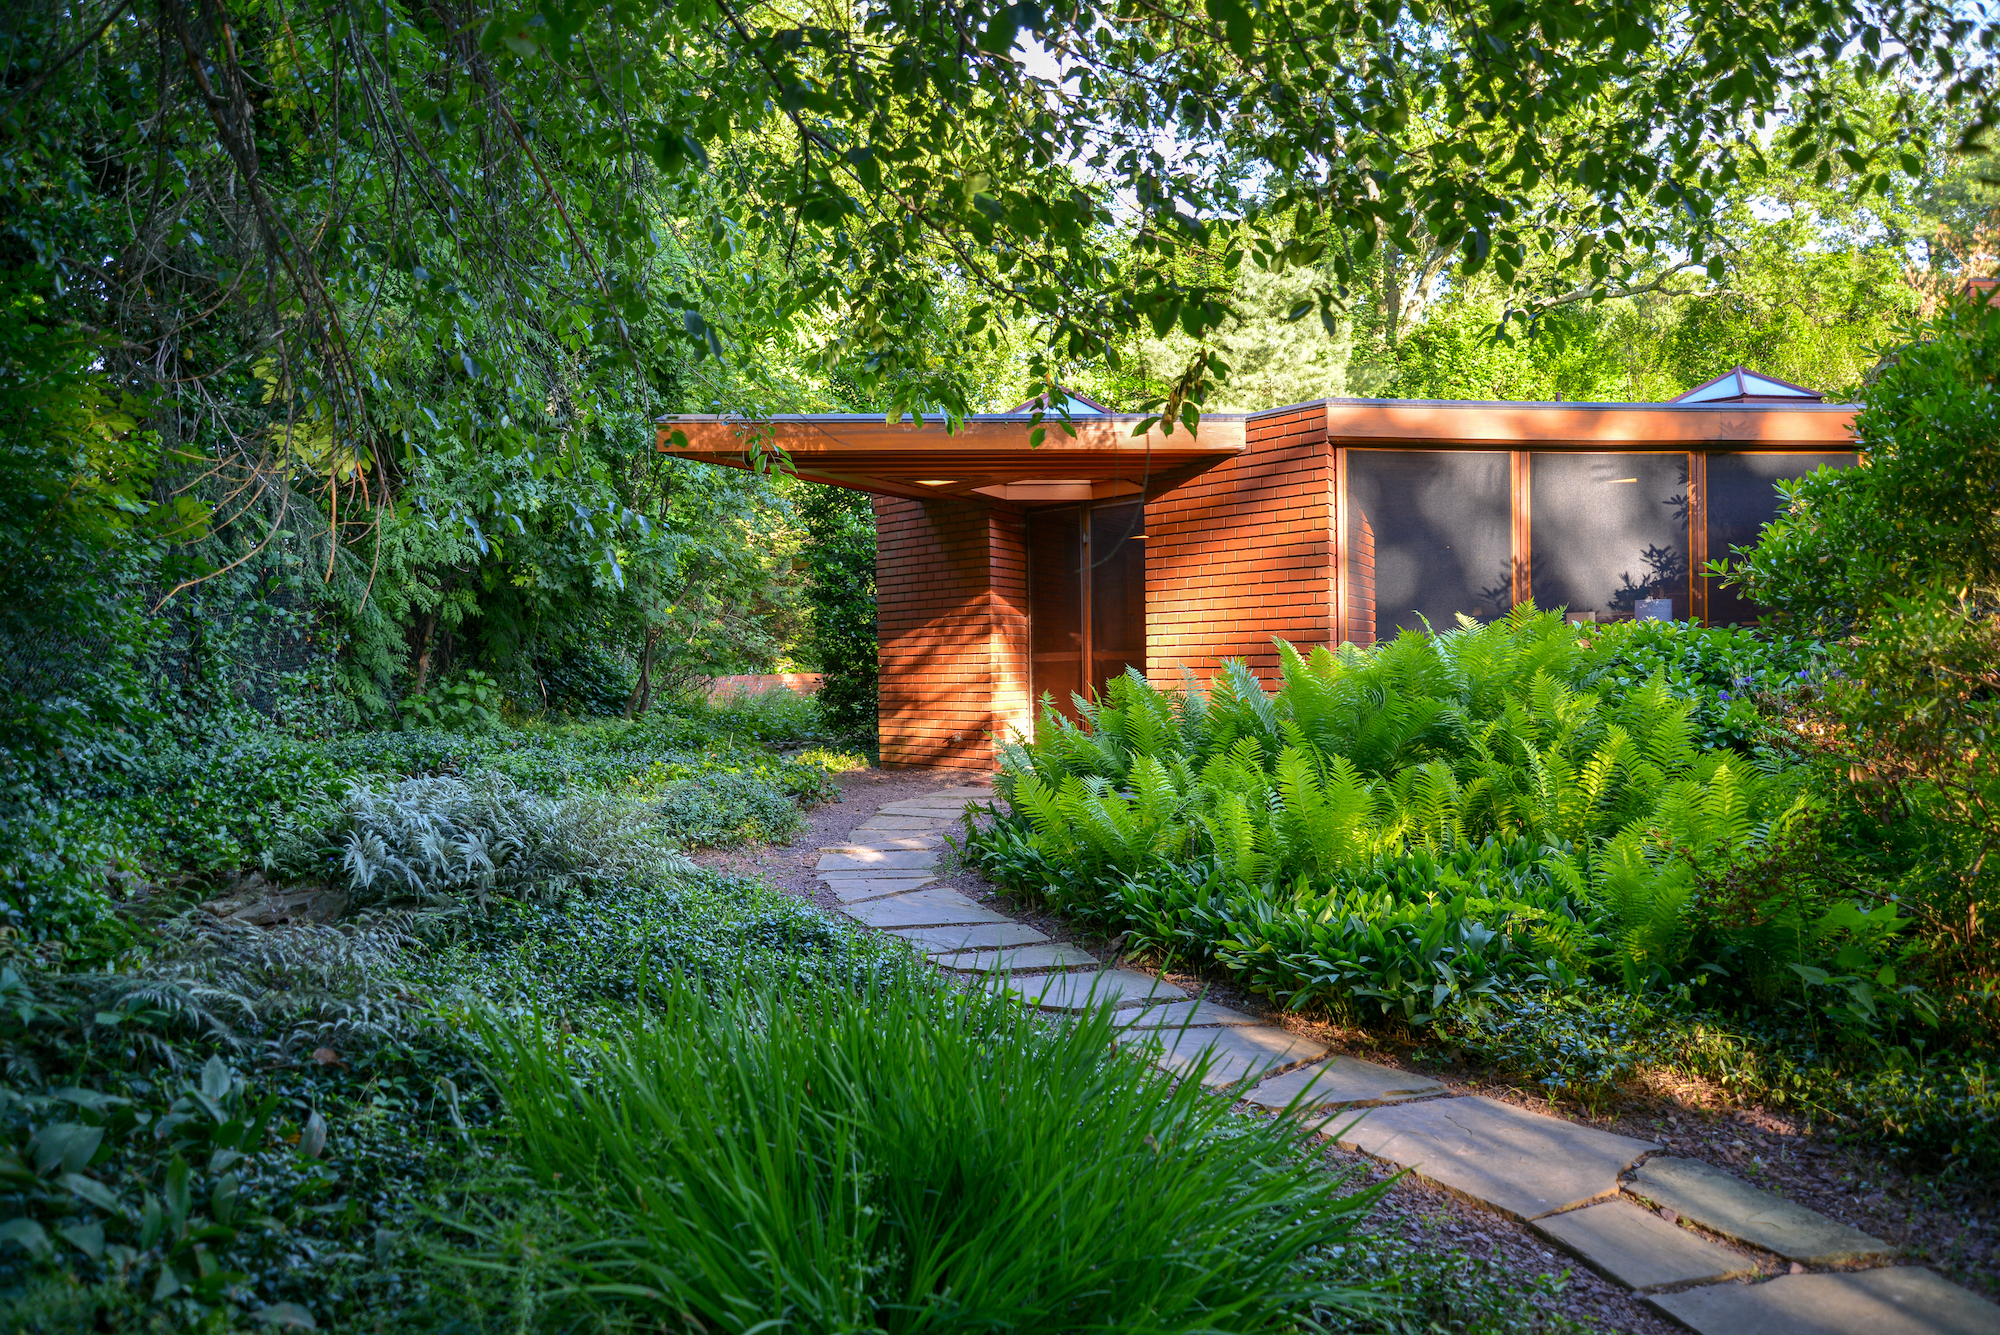 Frank Lloyd Wright's unique hexagonal house in Glen Ridge